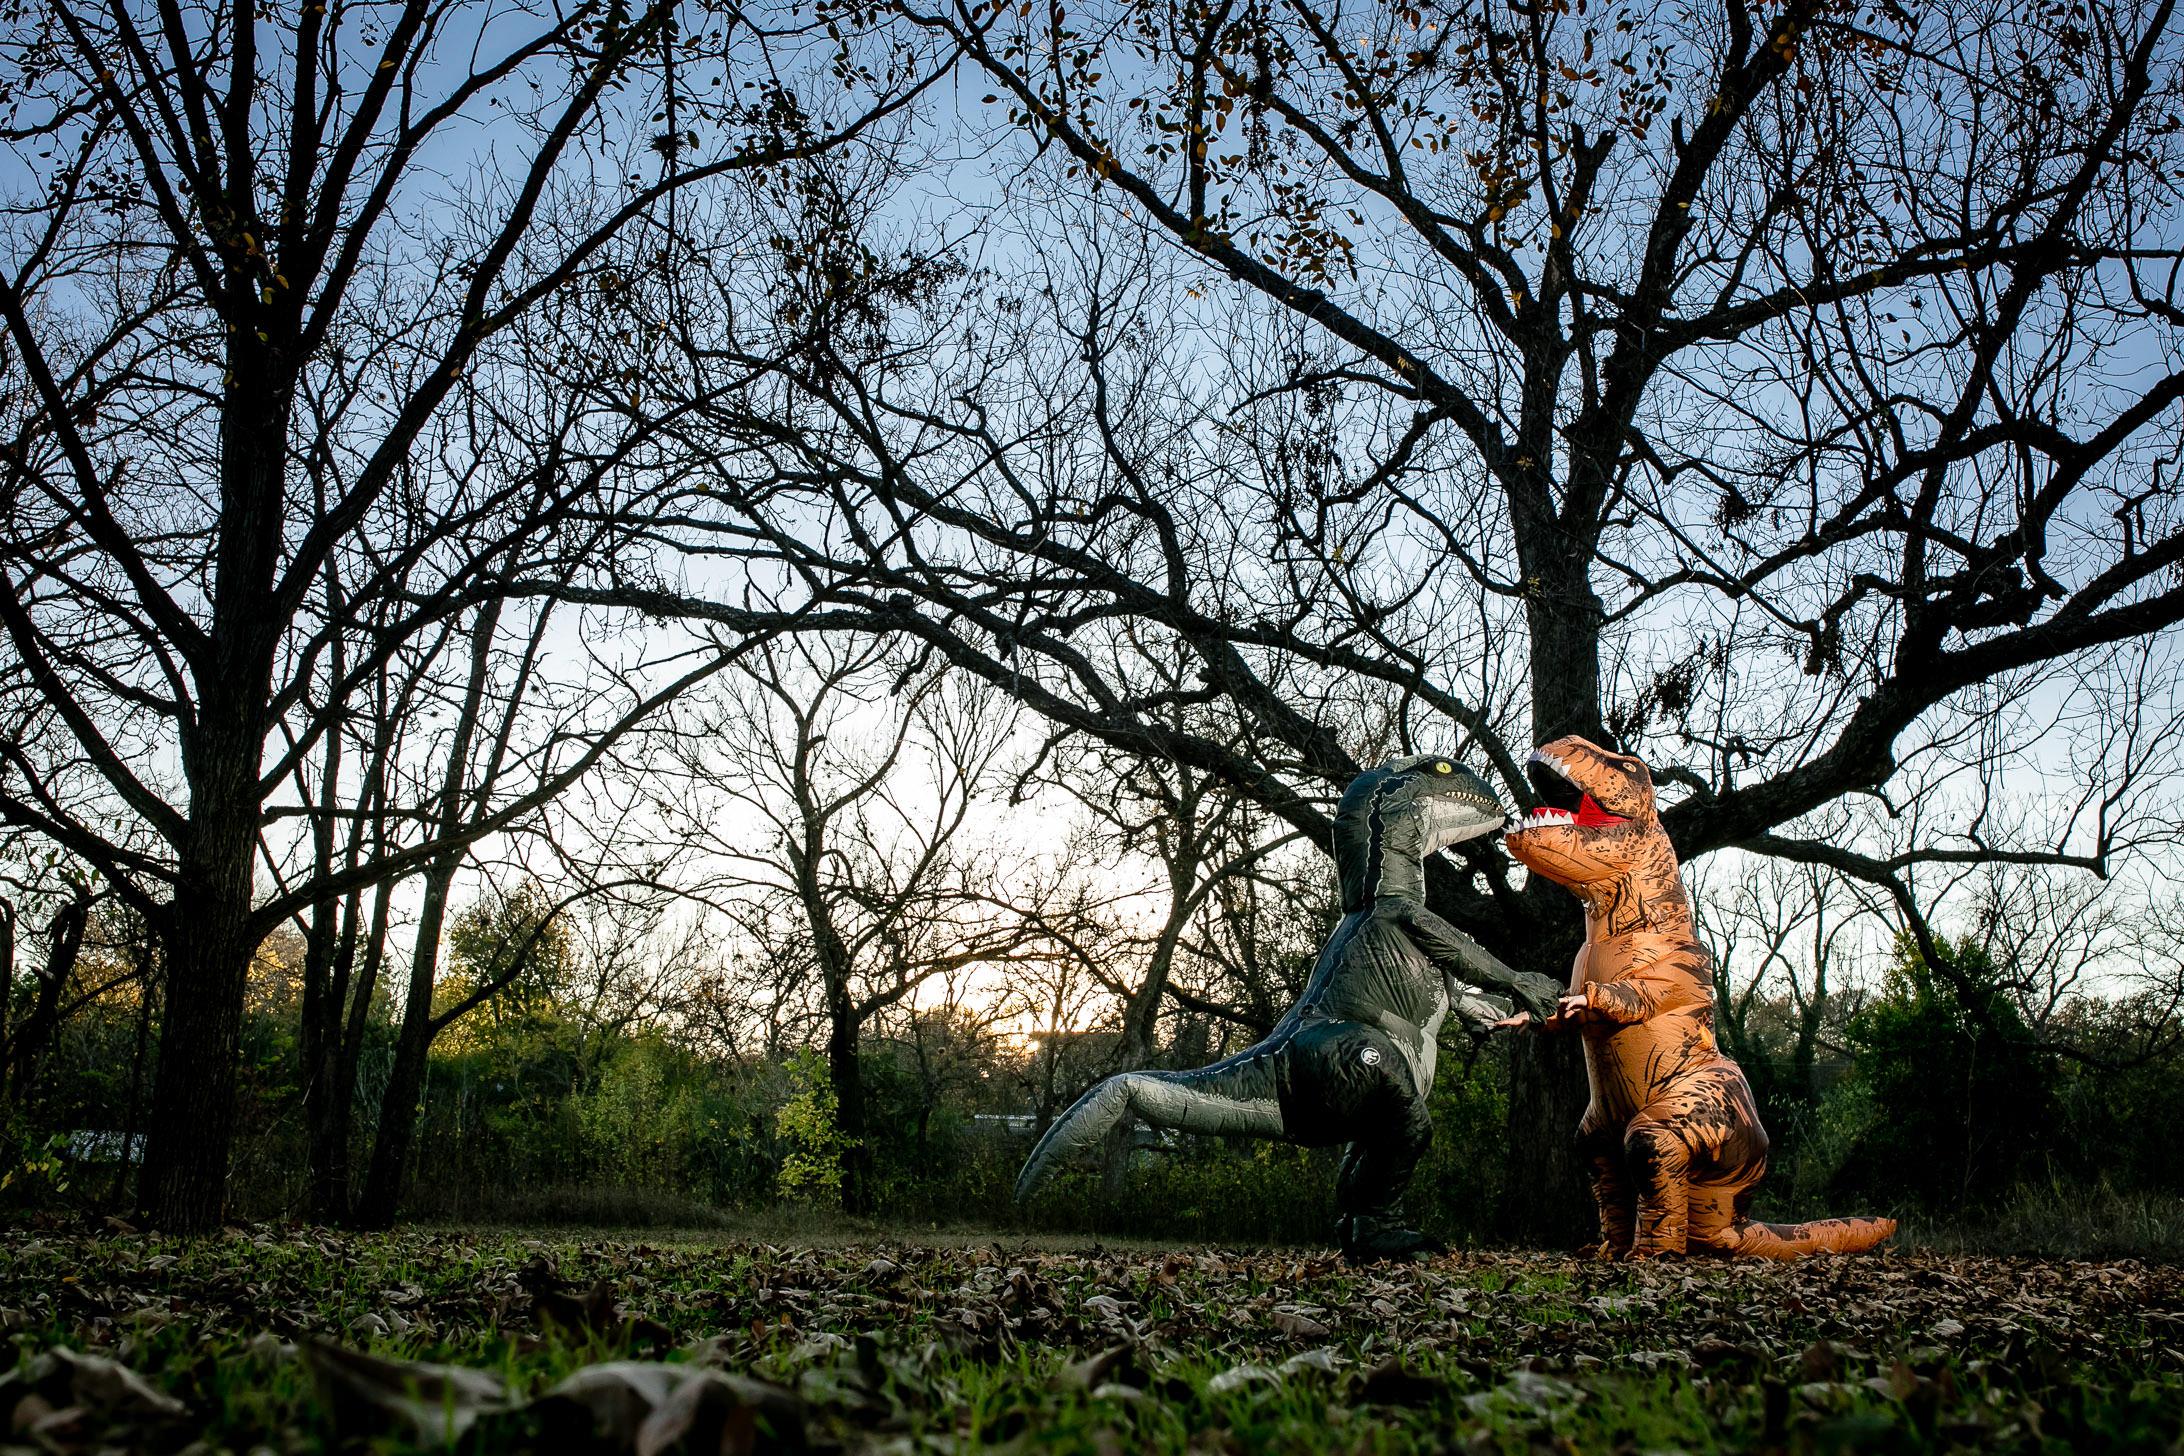 Dinosaur Engagement Session!